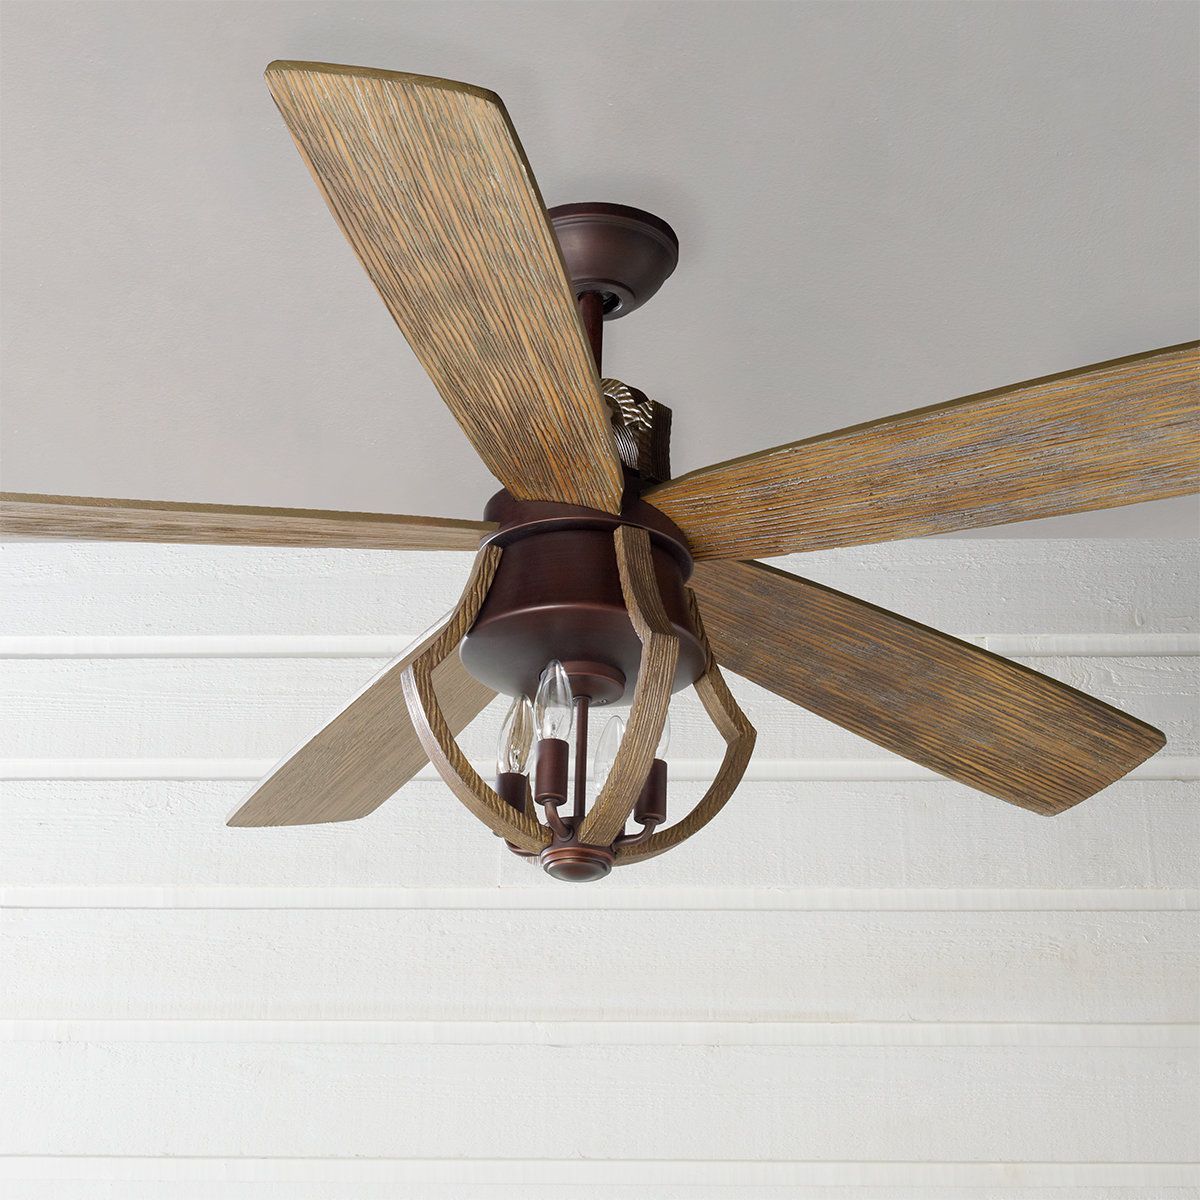 56 Indoor Rustic Wine Barrel Stave Ceiling Fan Ceiling Fan Light Kit Ceiling Fan Ceiling Fan With Light